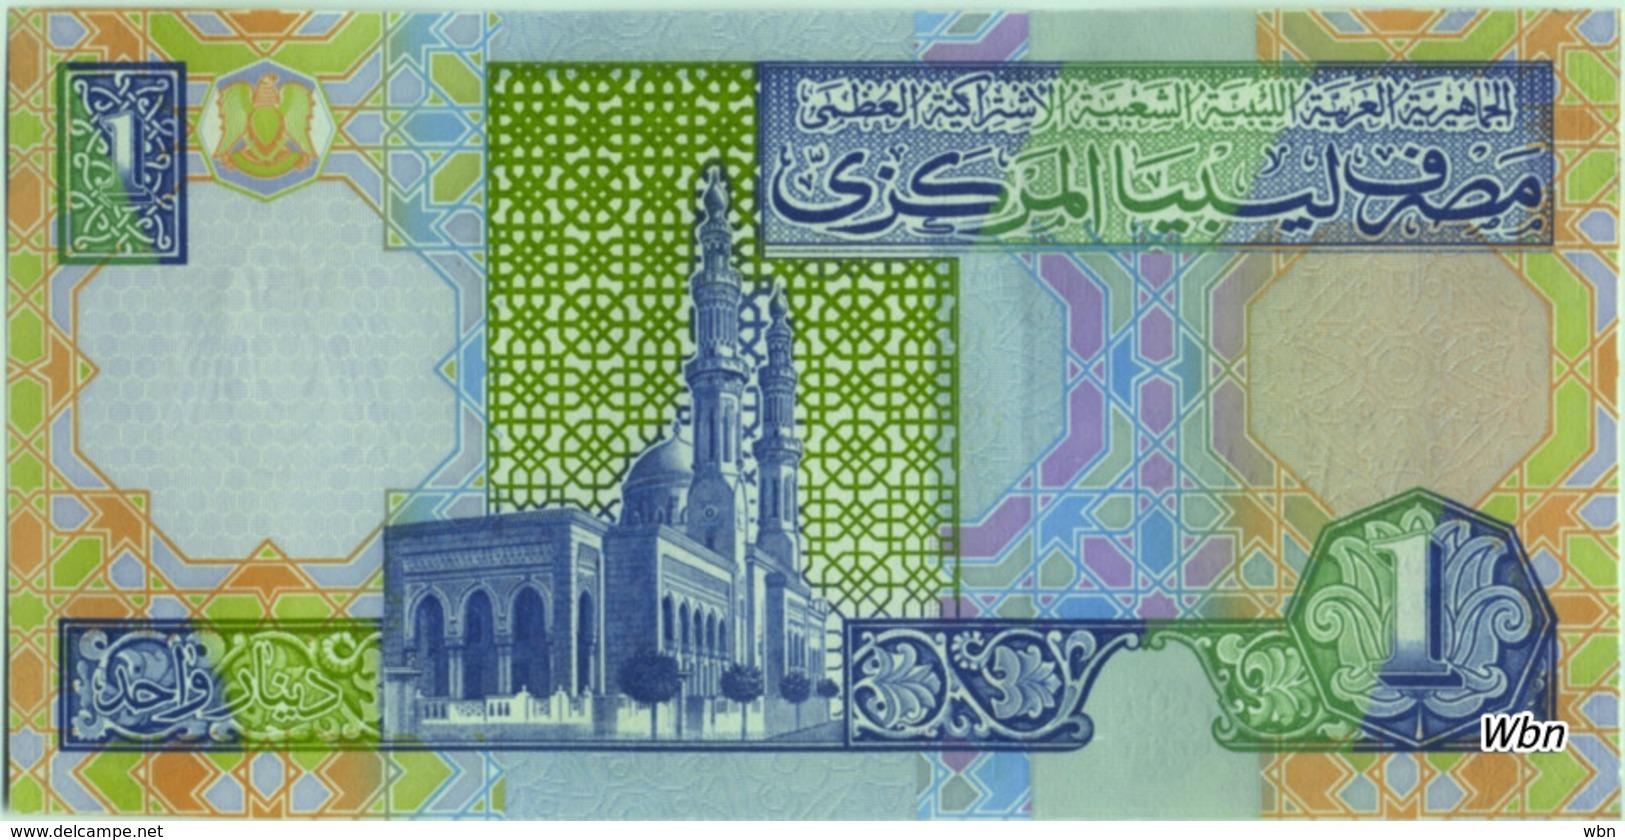 Libya 1 Dinar (P64) 2002 Sign 7 -UNC- - Libya